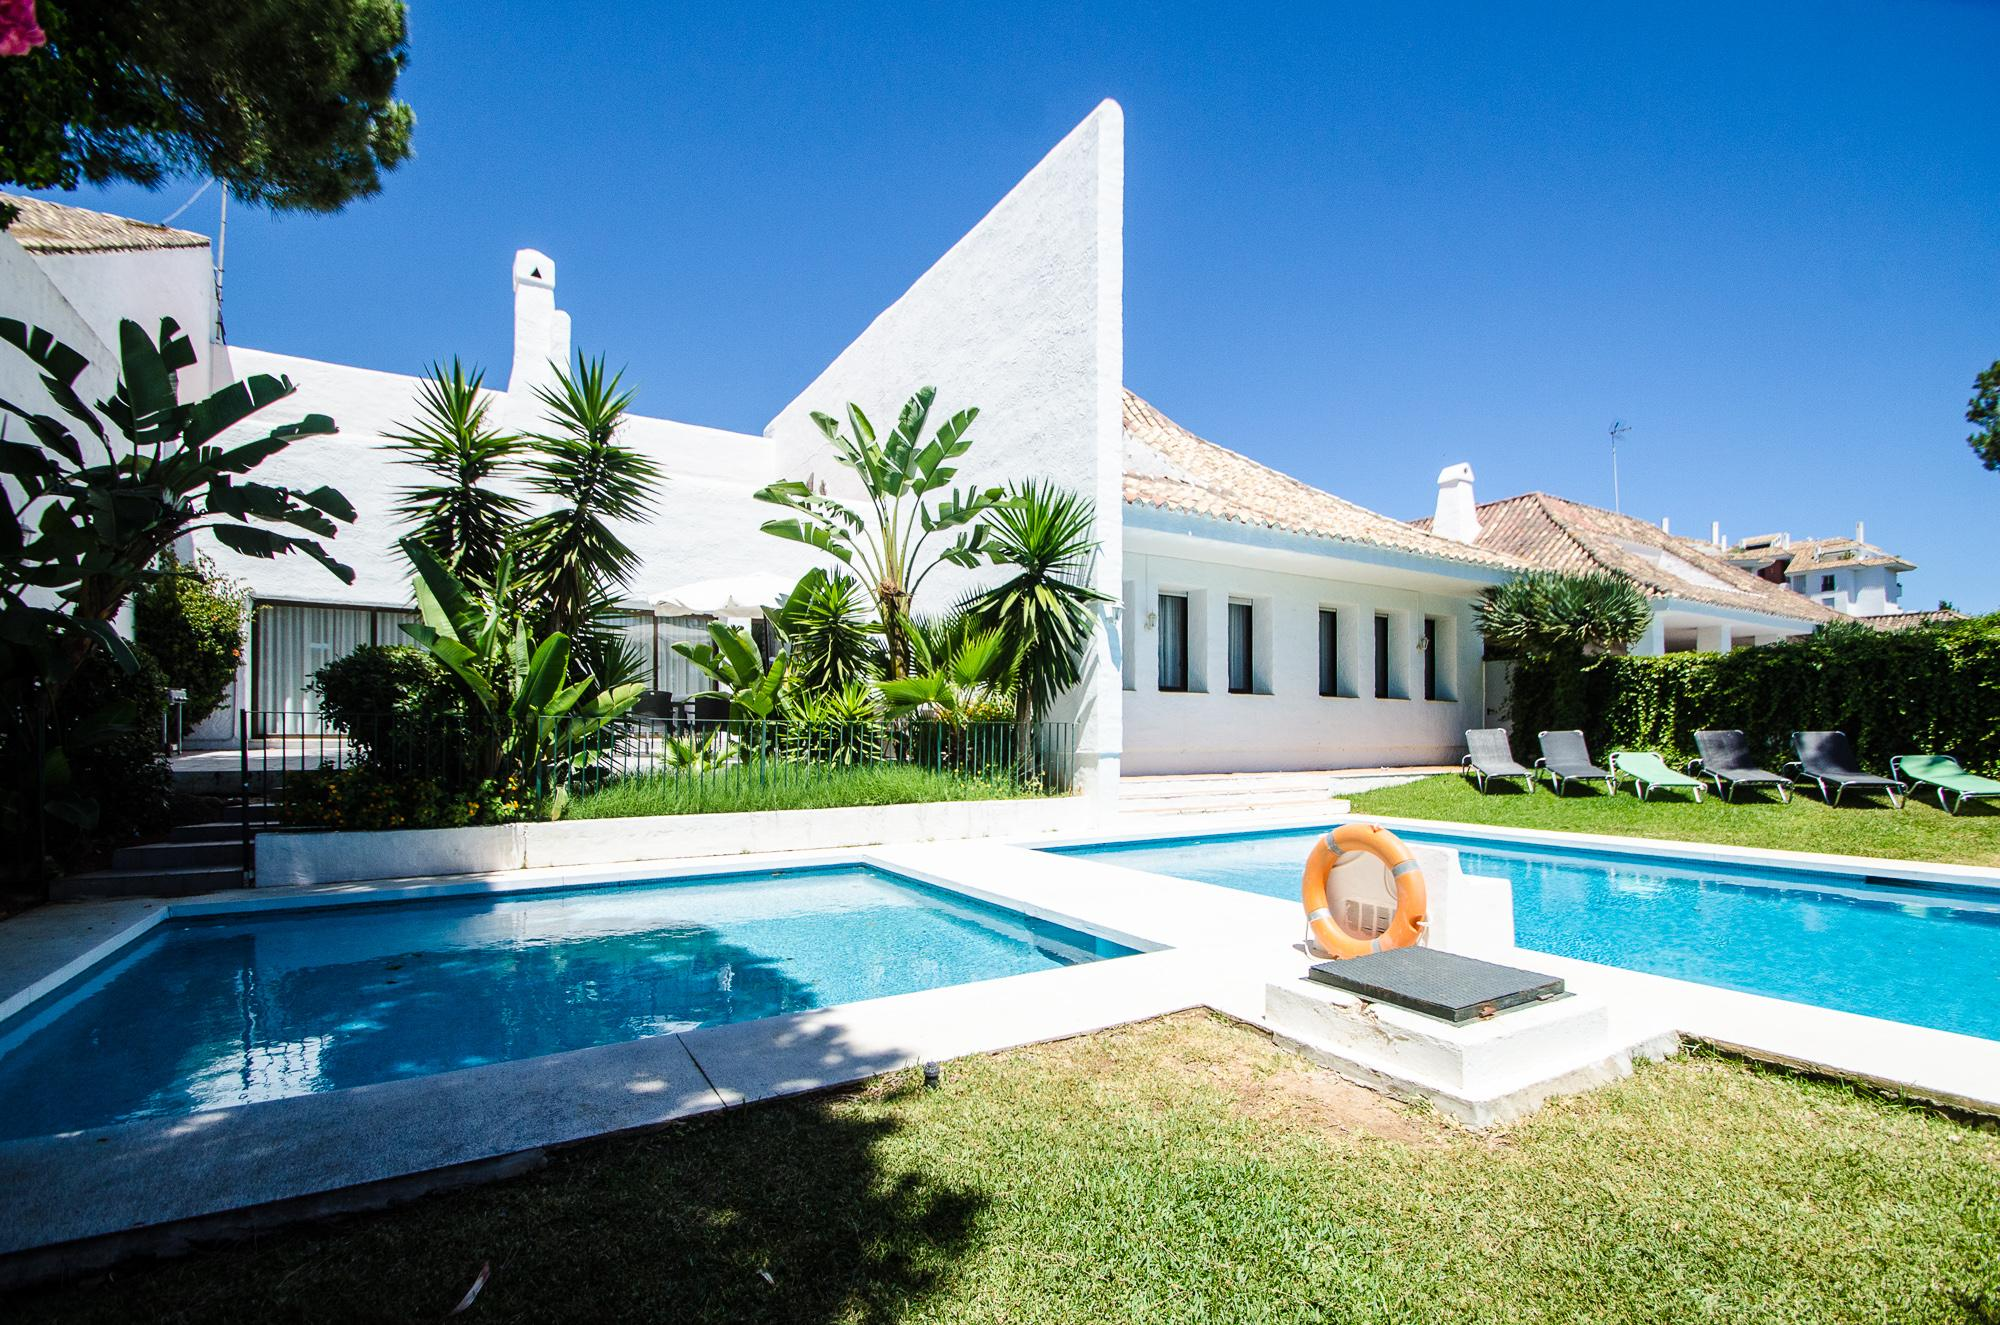 Villa Marina 5 bedrooms, Villa available for Holiday Rental in Puerto Banus, Marbella, Spain